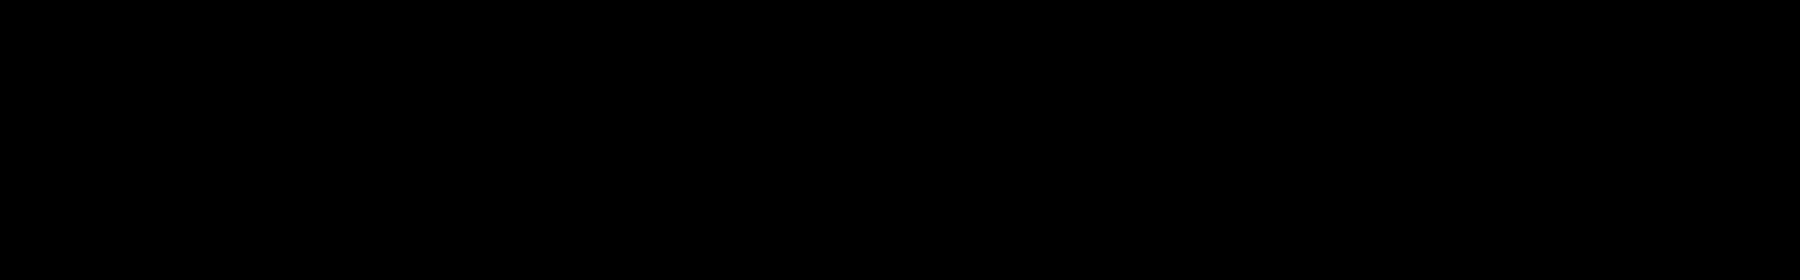 Dynamic Chords For Ableton audio waveform